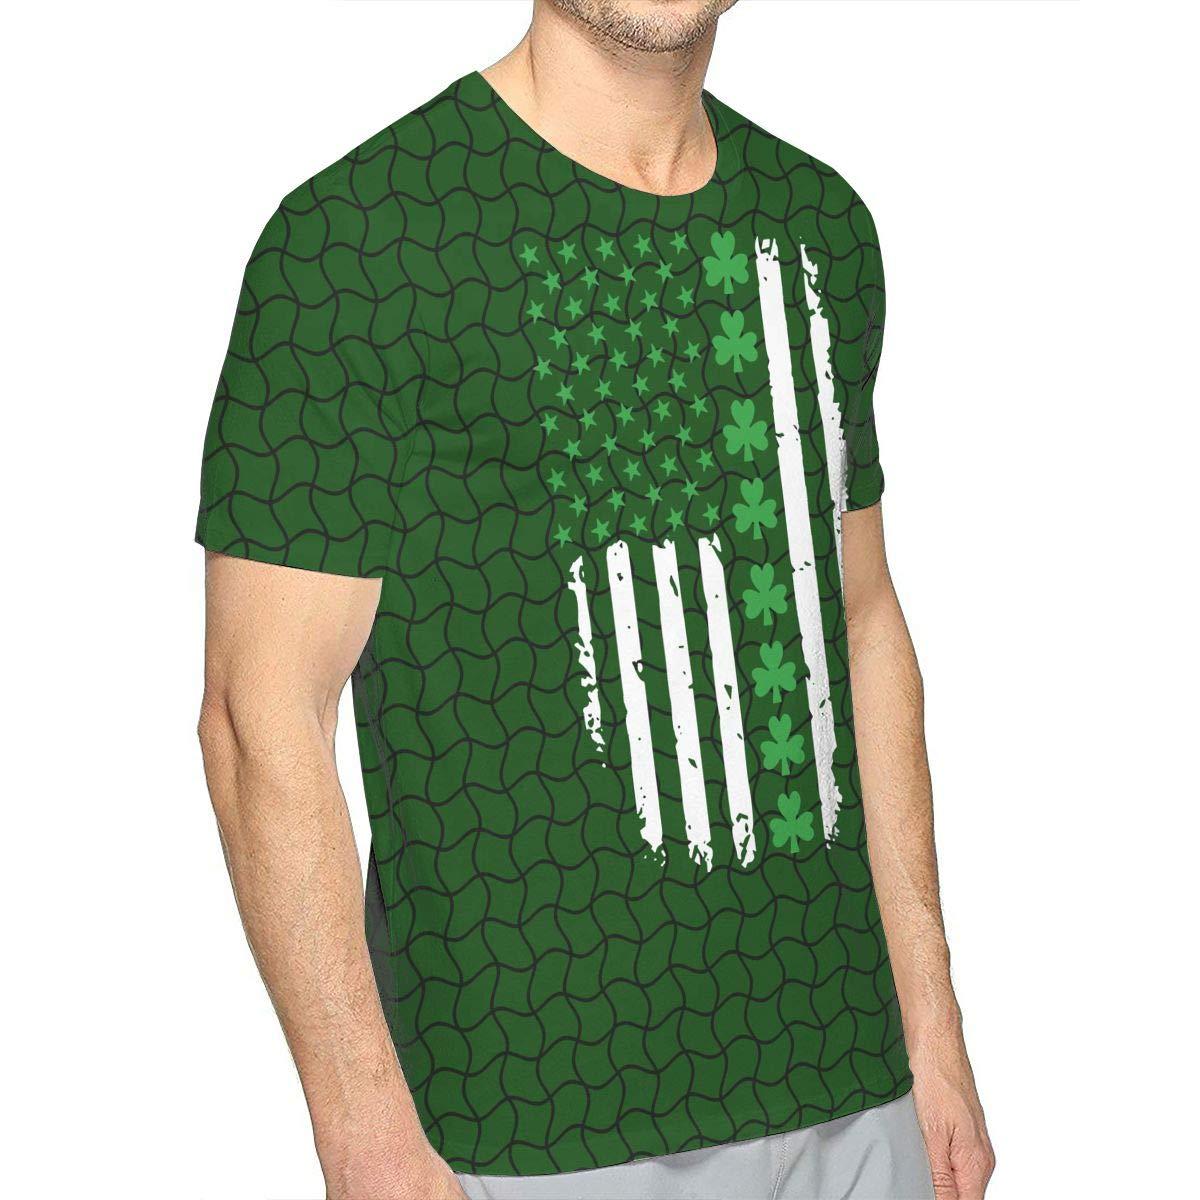 JJKKFG-H St Patricks Day Irish American Flag Mens Fashion Short-Sleeved T Shirt